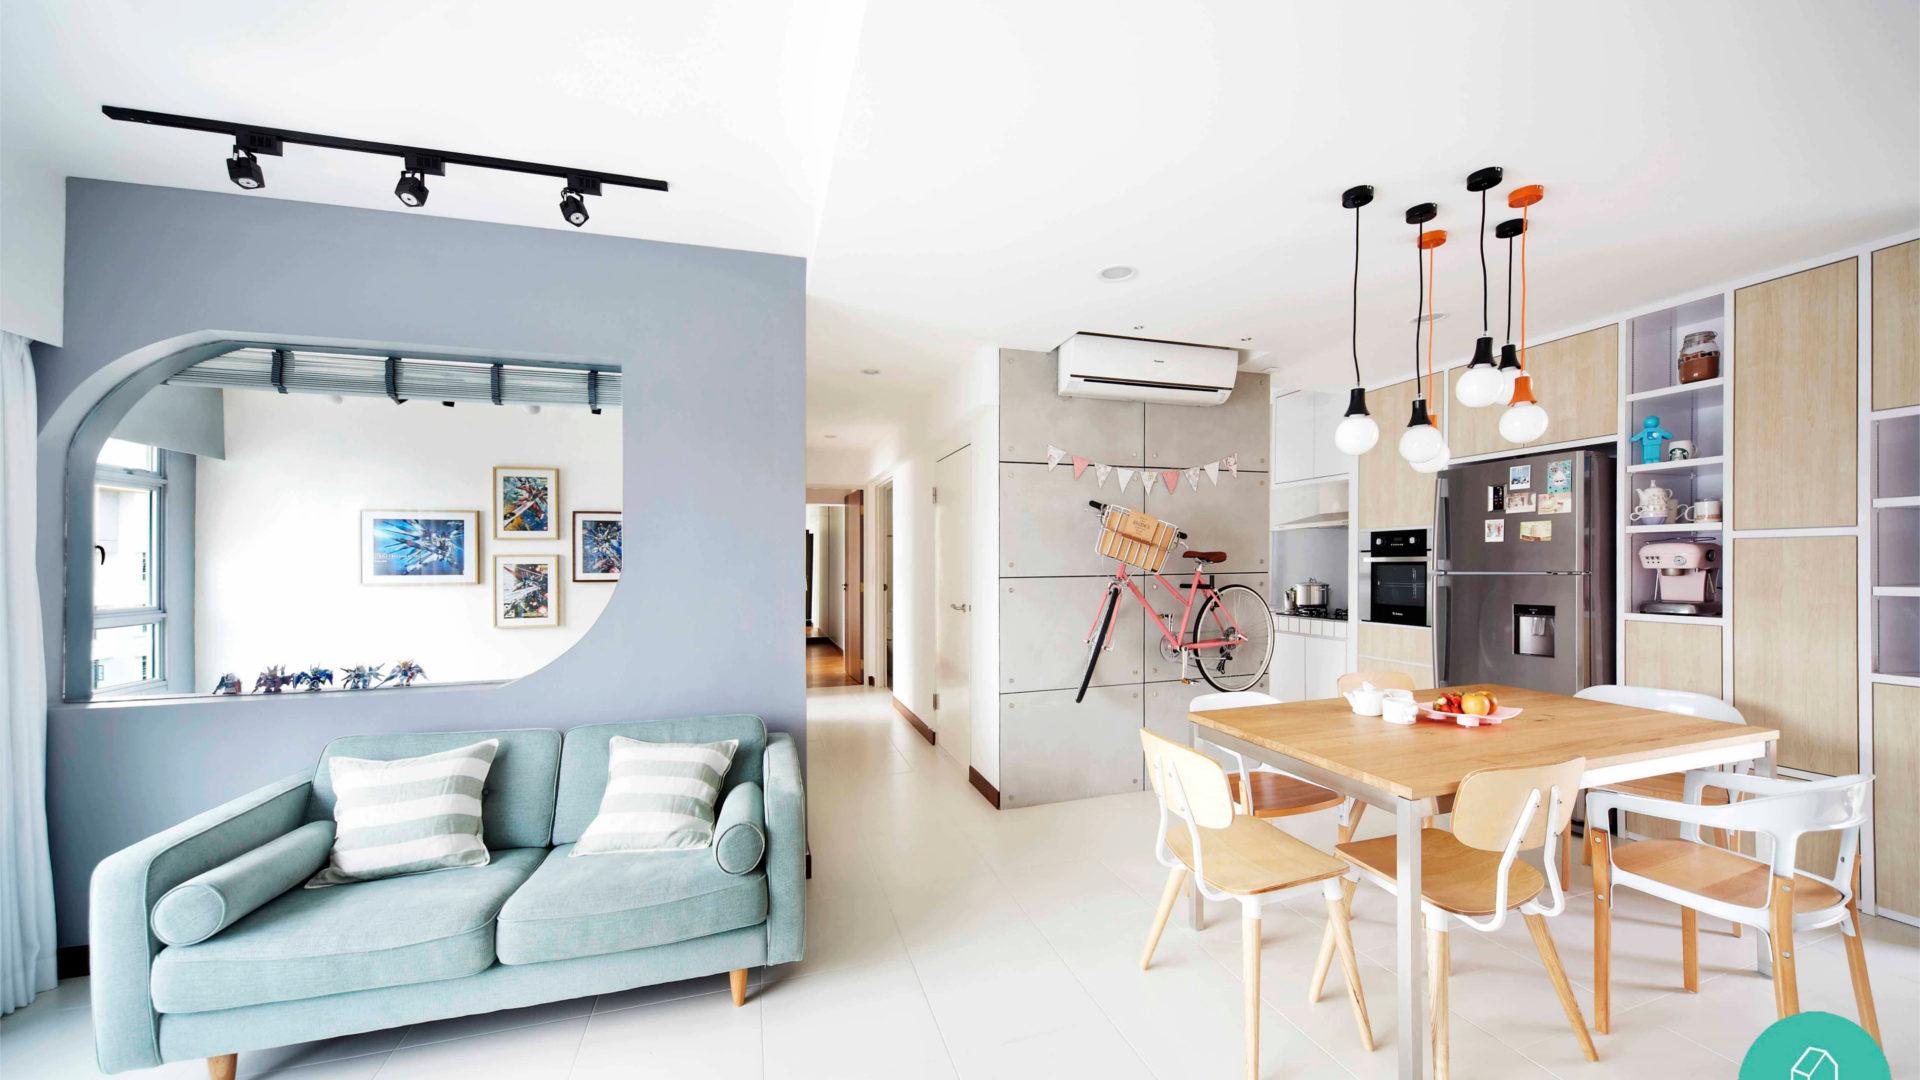 Design Trends Premium: 9 Scandinavian Interior Designs